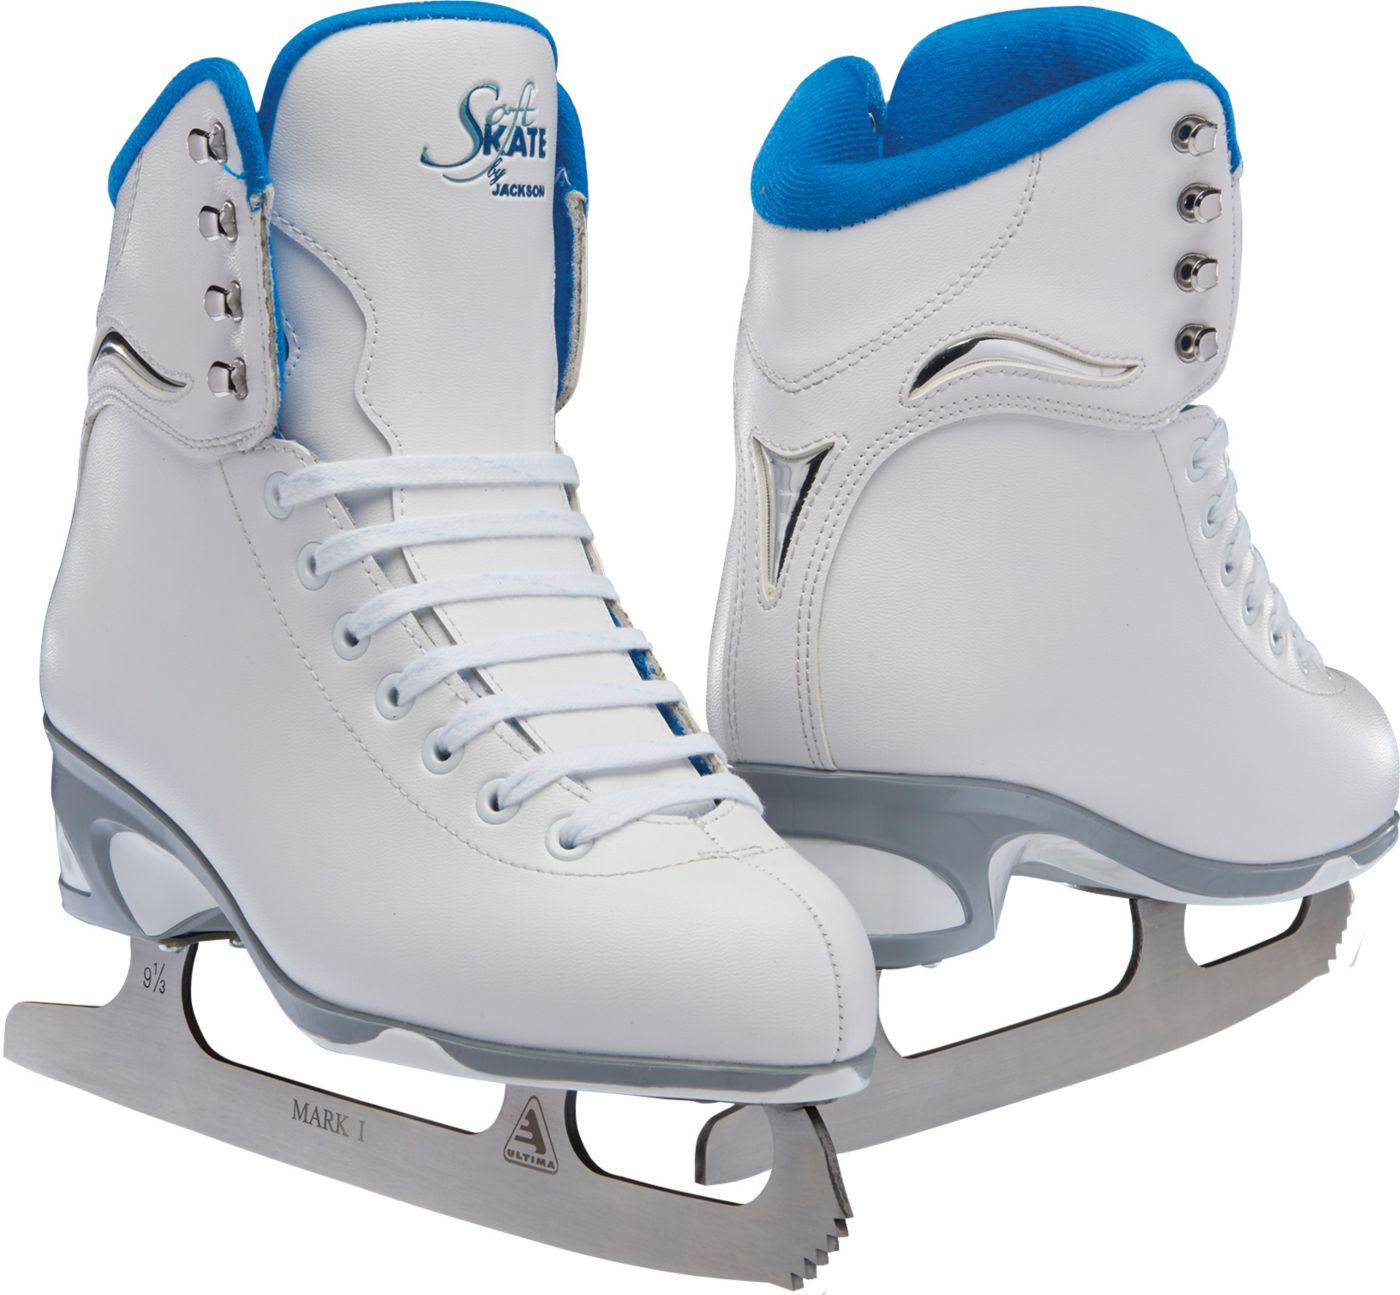 Jackson Ultima Women's SoftSkate 180 Recreational Ice Skates